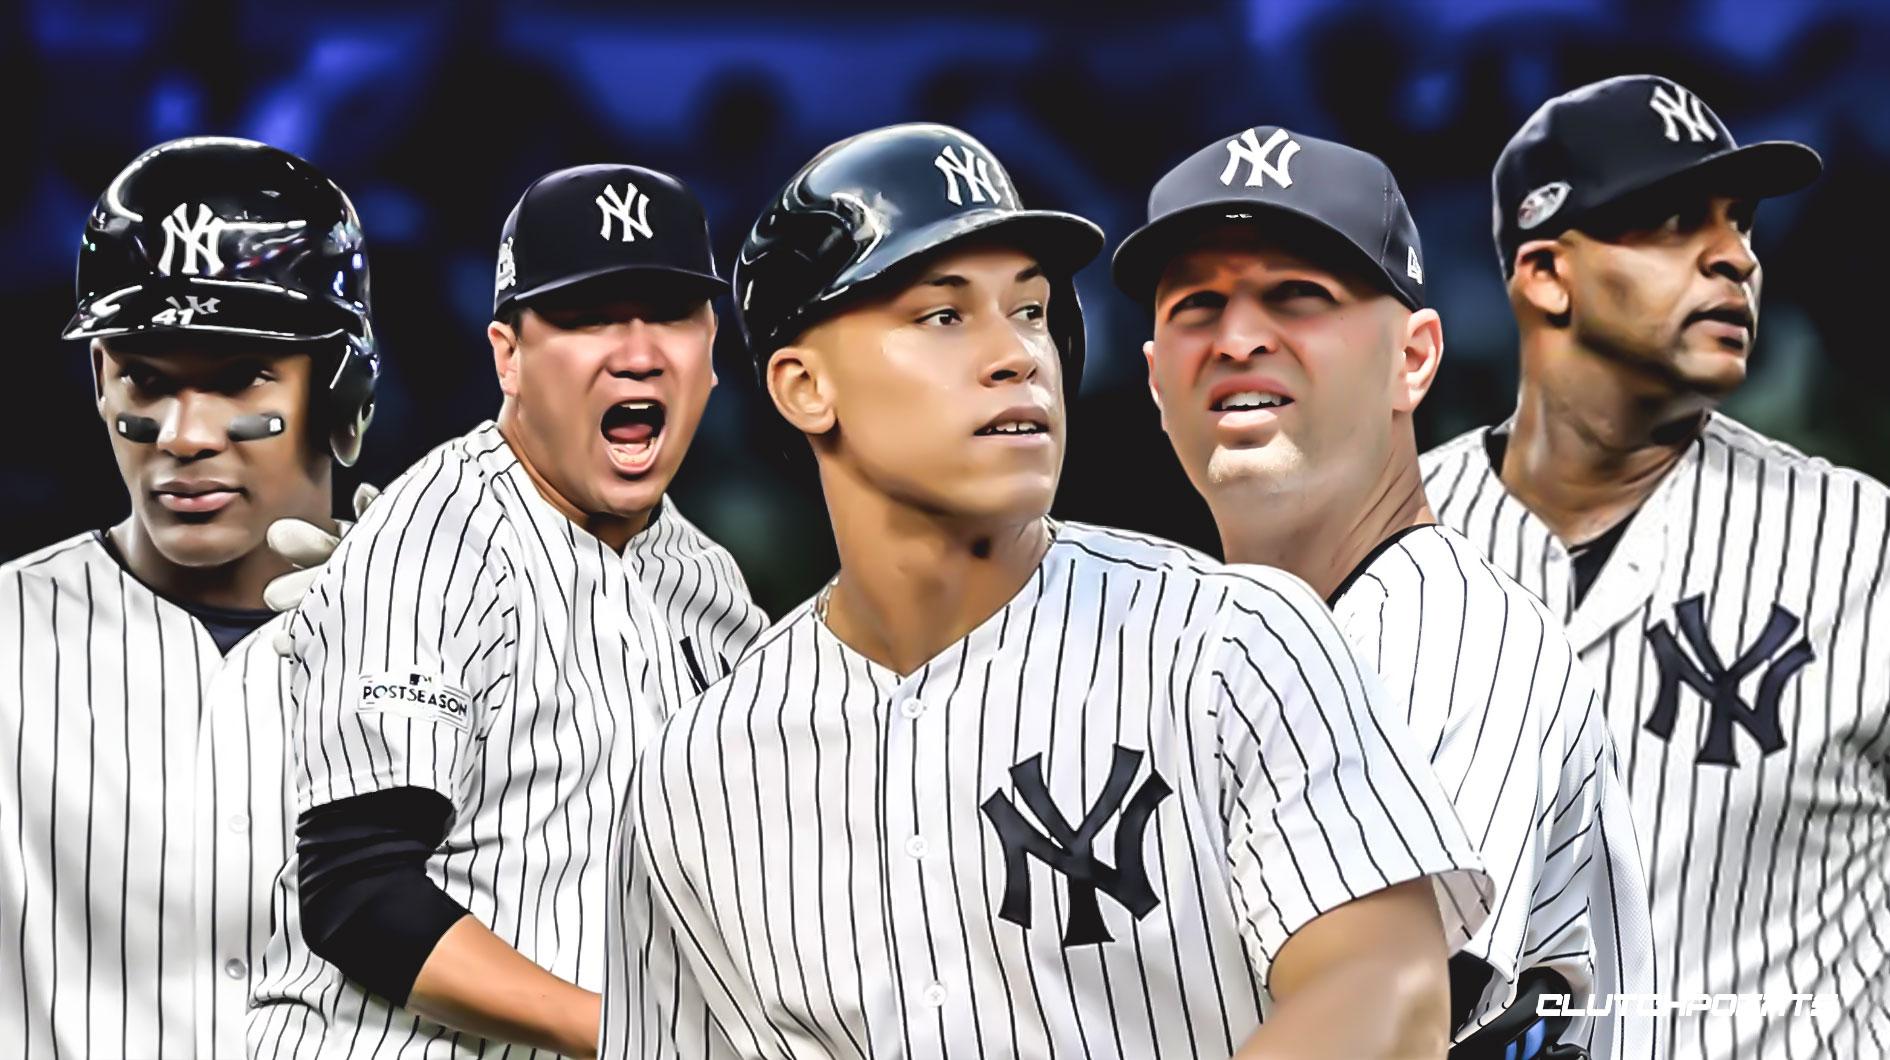 https://clutchpoints.com/wp-content/uploads/2019/02/New-York-Yankees.jpg